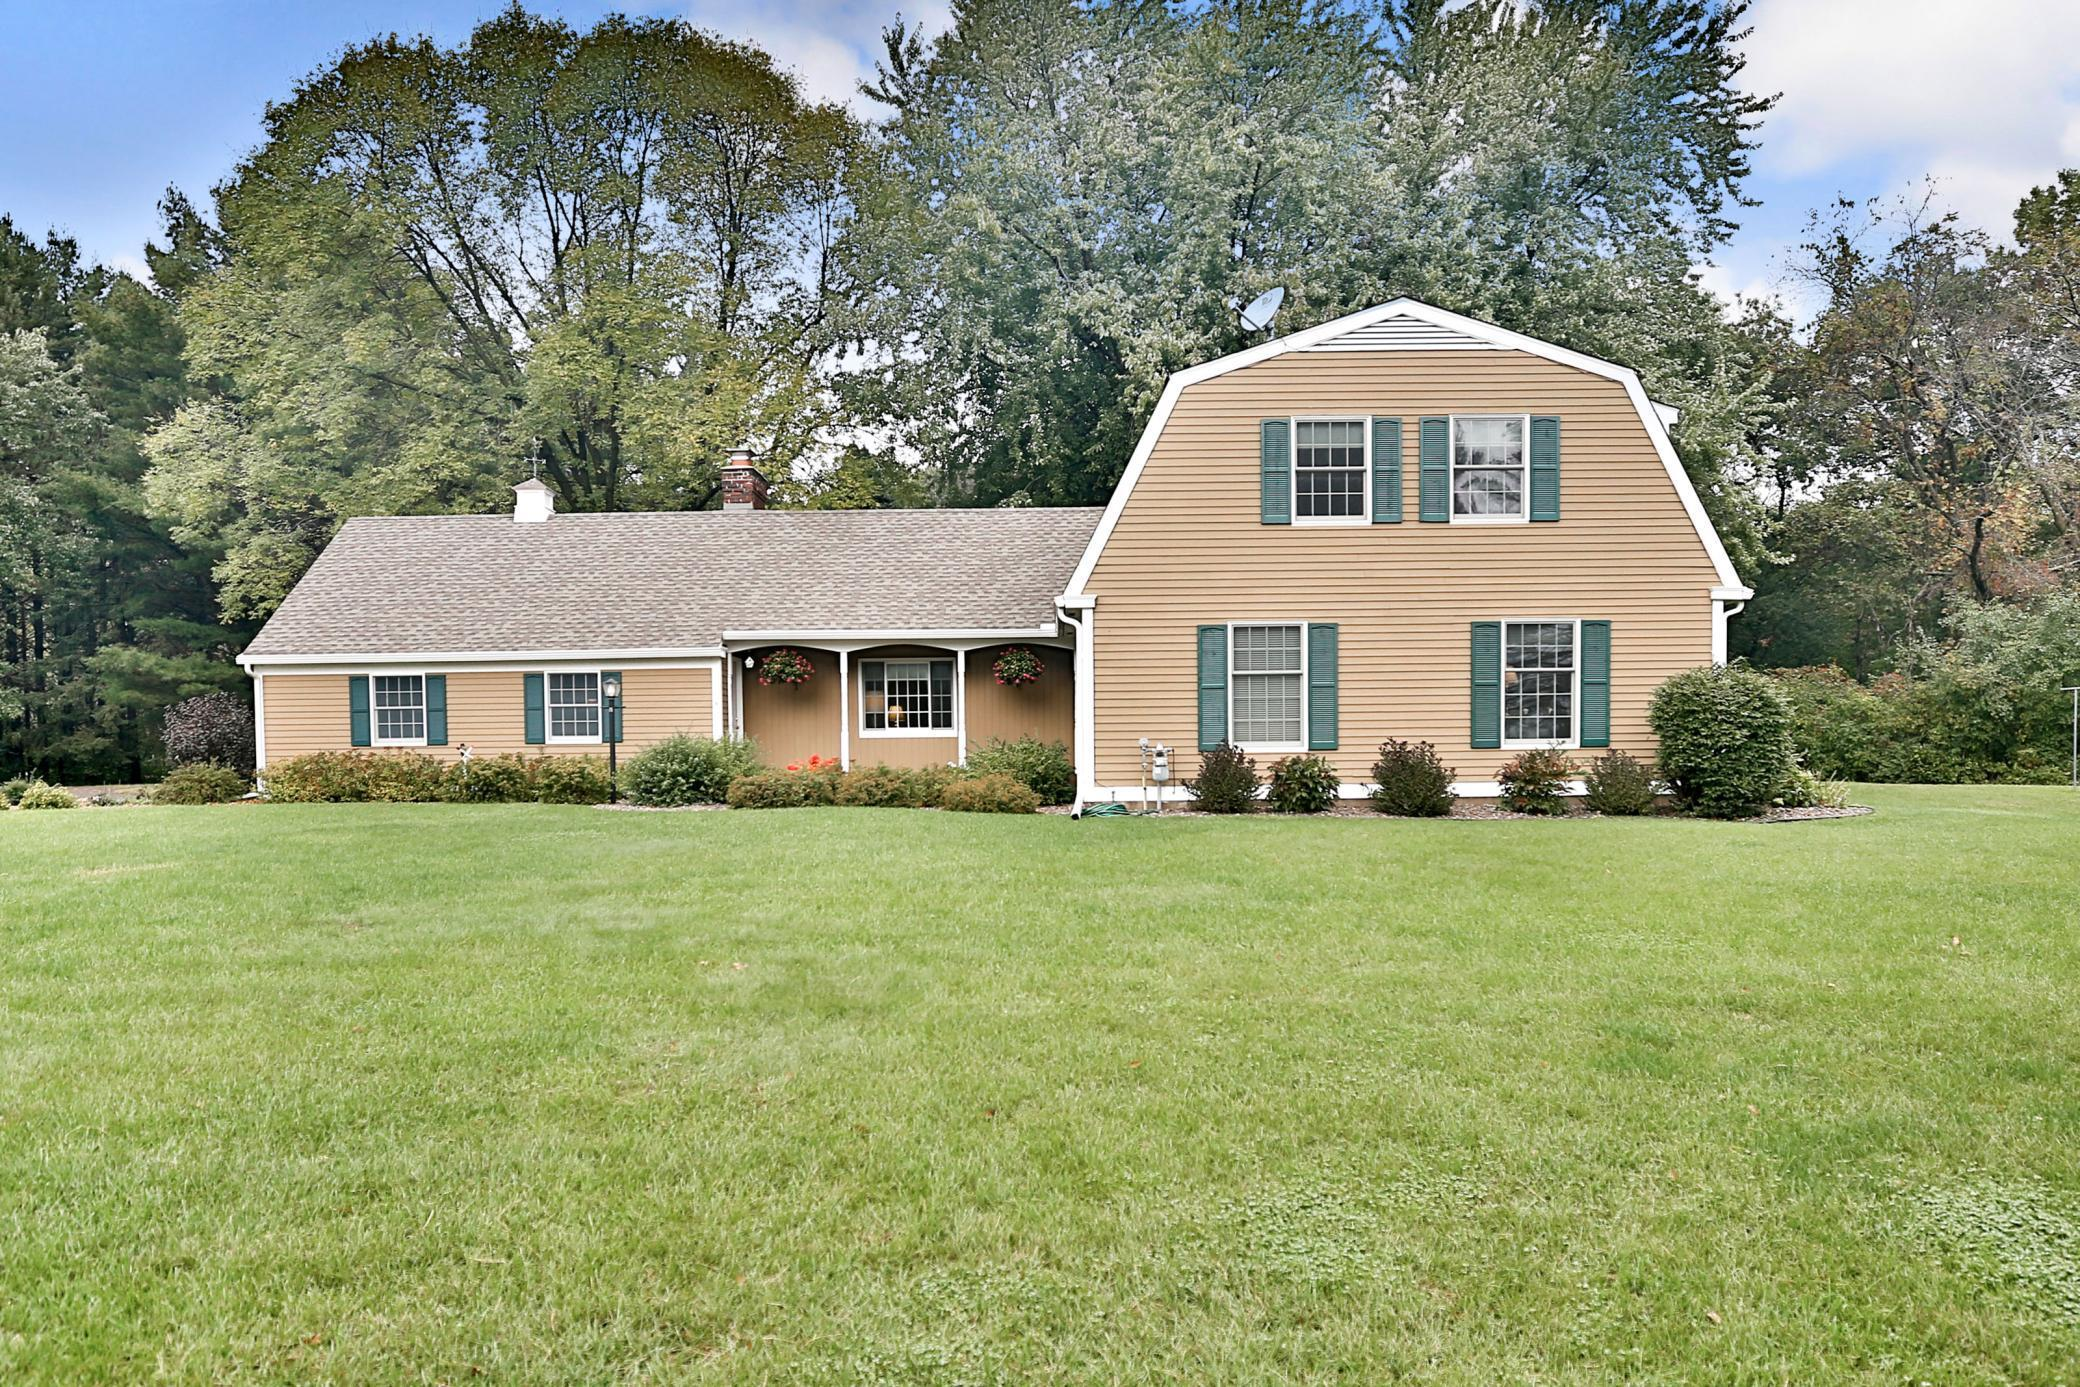 19720 Parkview Lane N Property Photo - Scandia, MN real estate listing